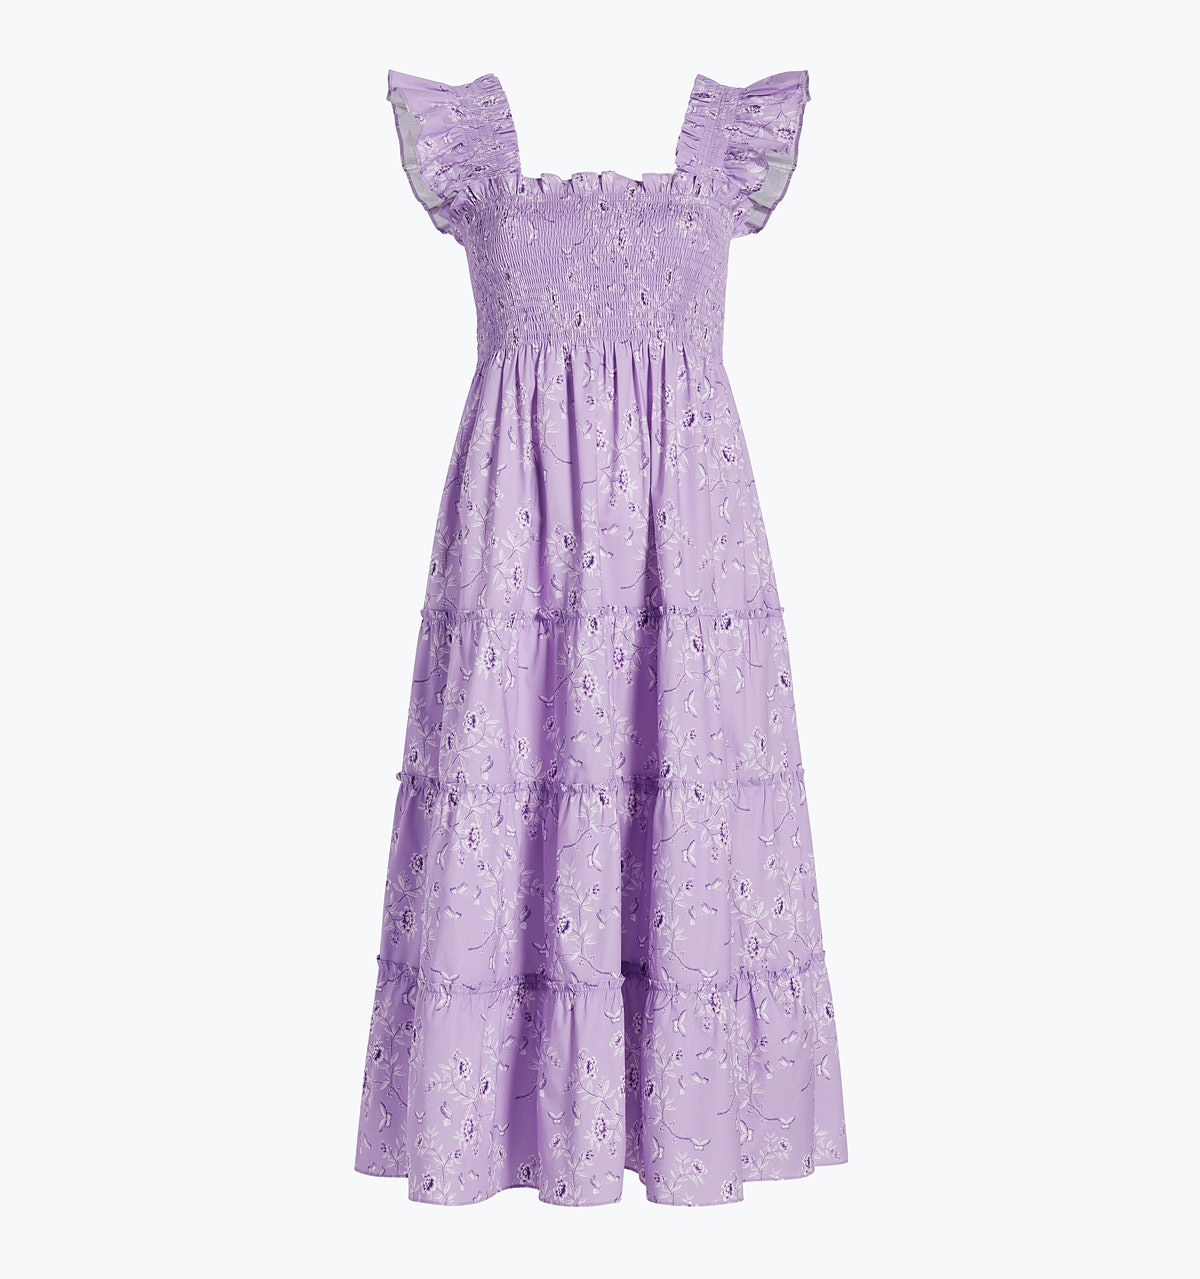 Bridgerton x Phenomenal x Hill House Home The Ellie Nap Dress